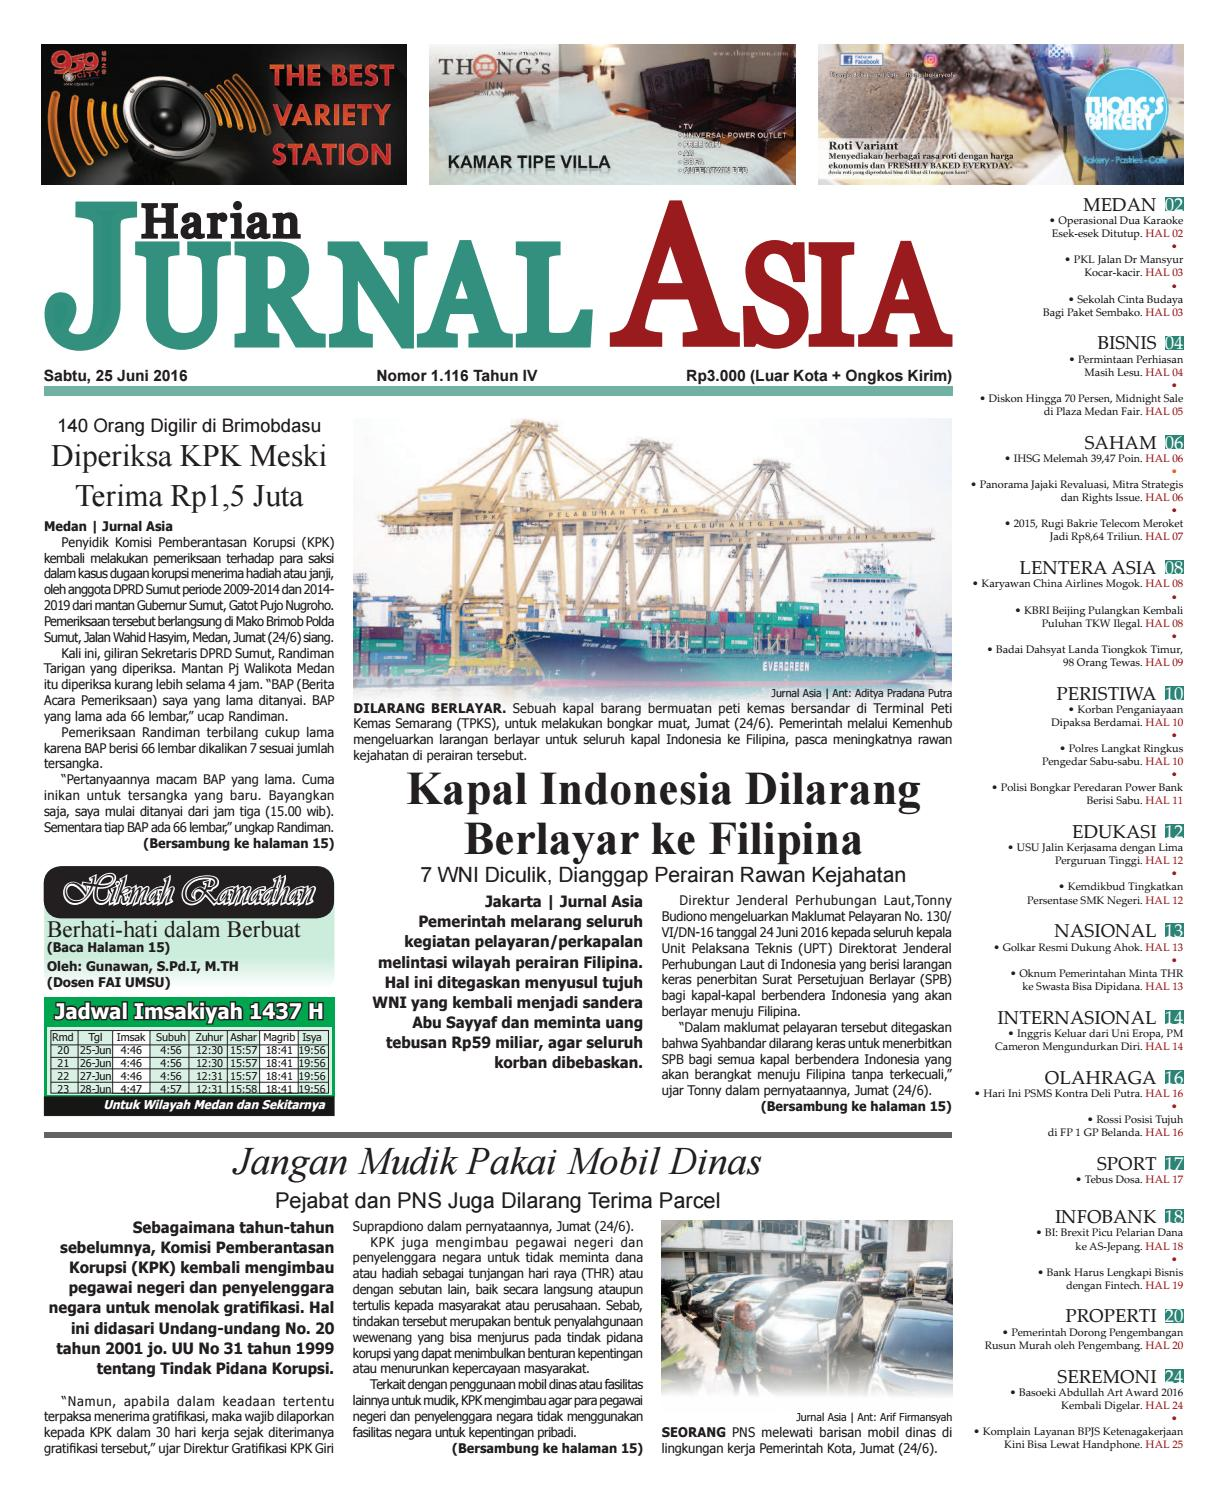 Harian Jurnal Asia Edisi Sabtu 25 Juni 2016 By Parcel Makanan Pja 1606 Medan Issuu